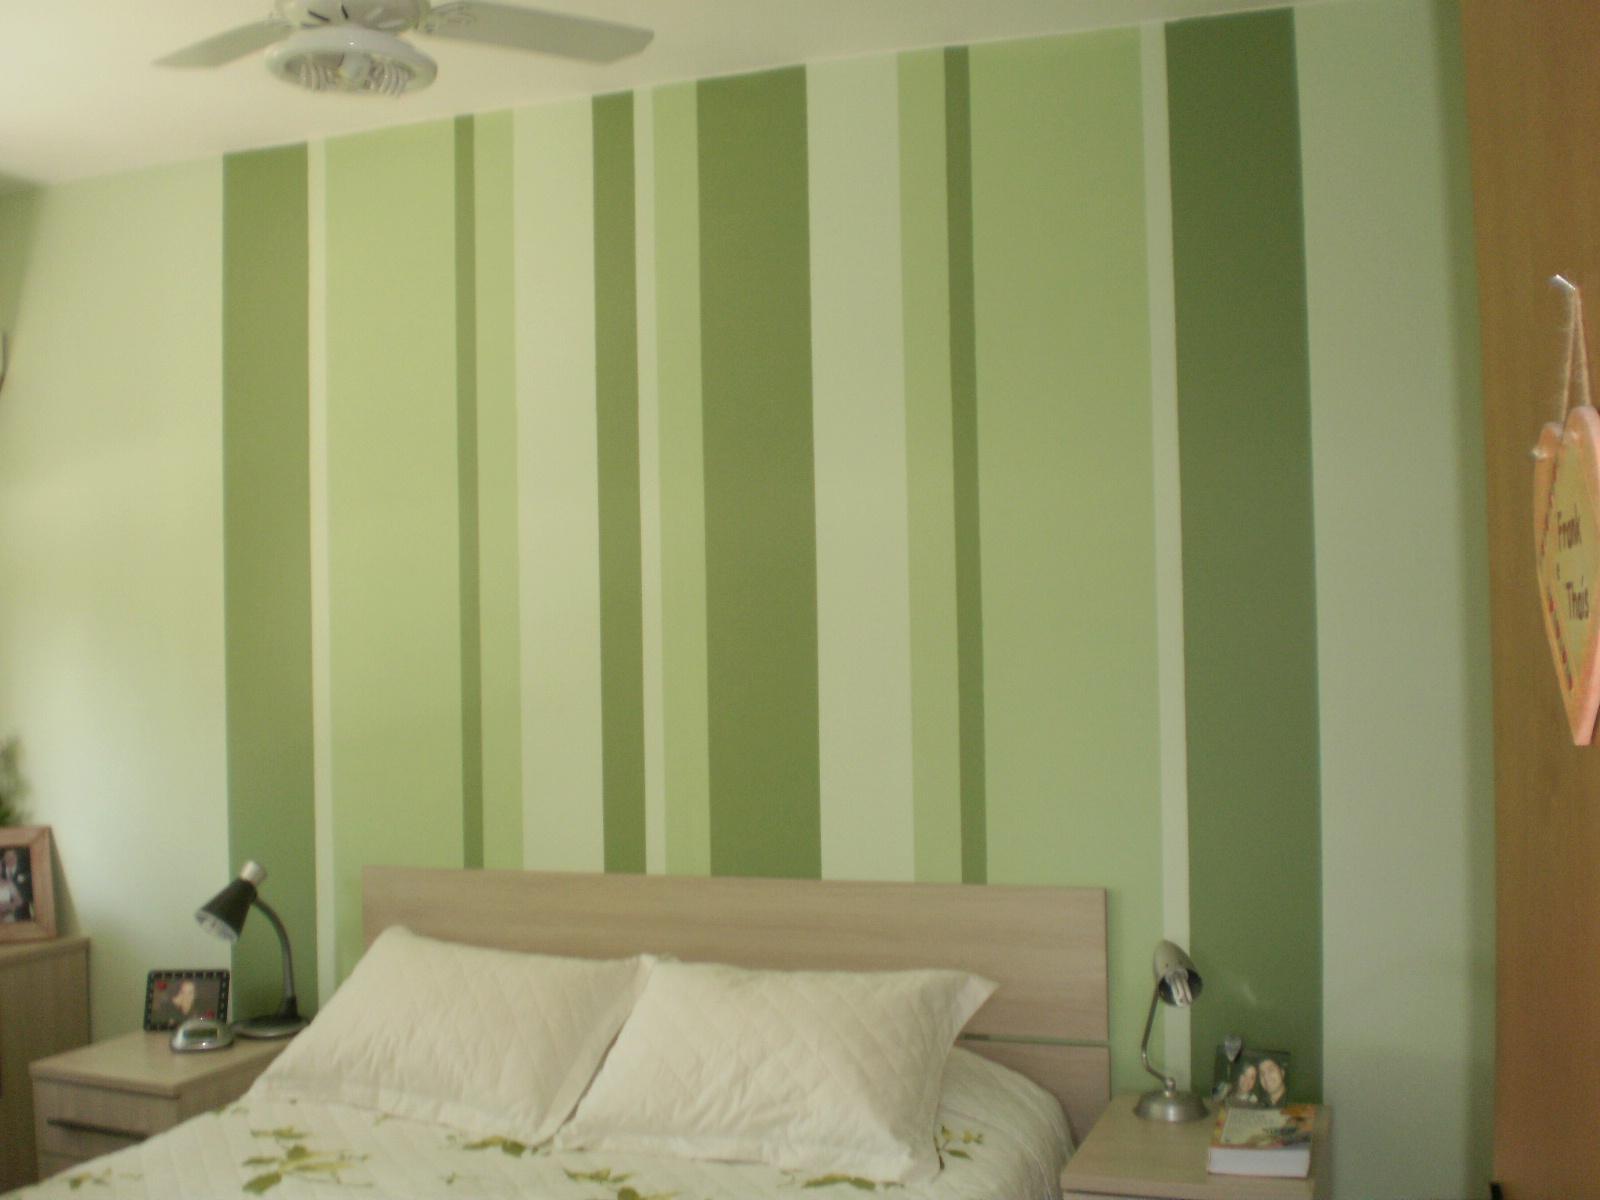 Tutorial listras na parede striped wall part 1 - Pinturas para paredes ...